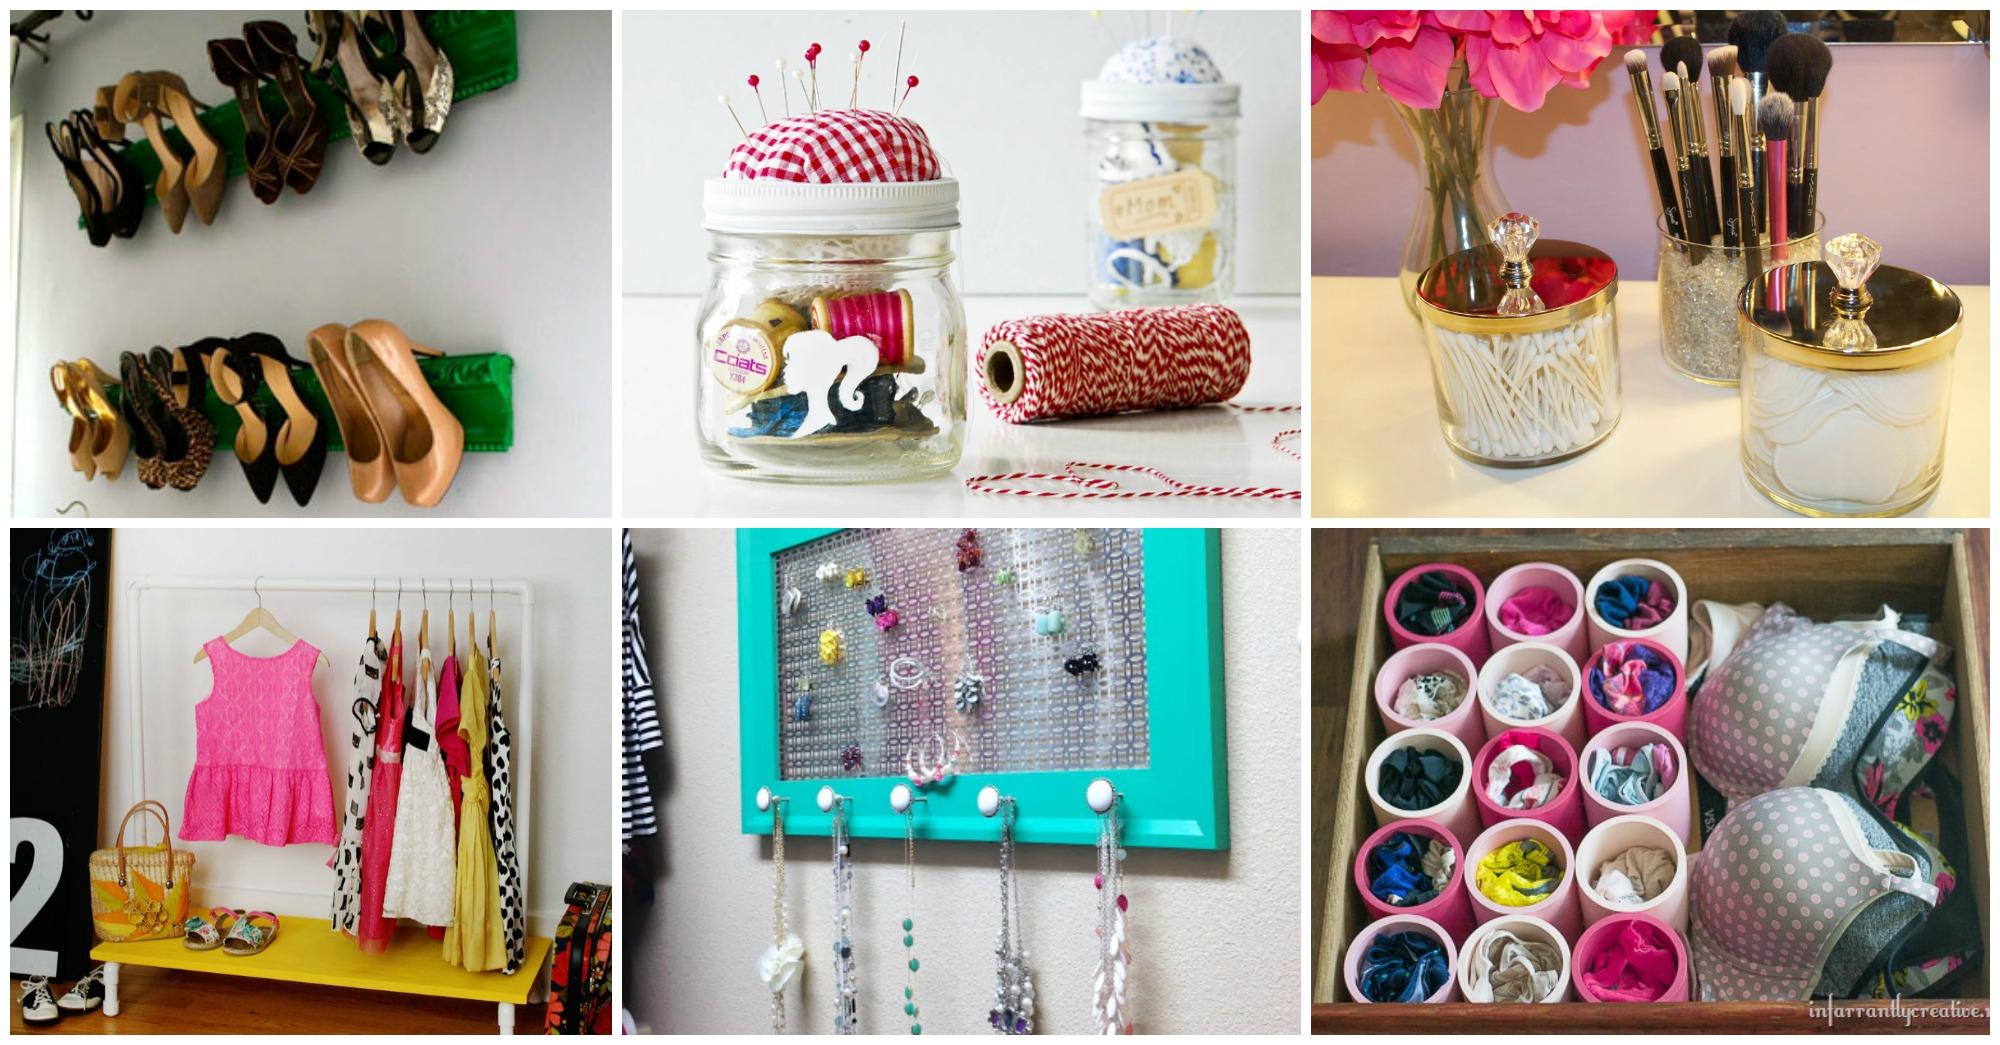 Fantastic DIY Ideas Every Woman Should See